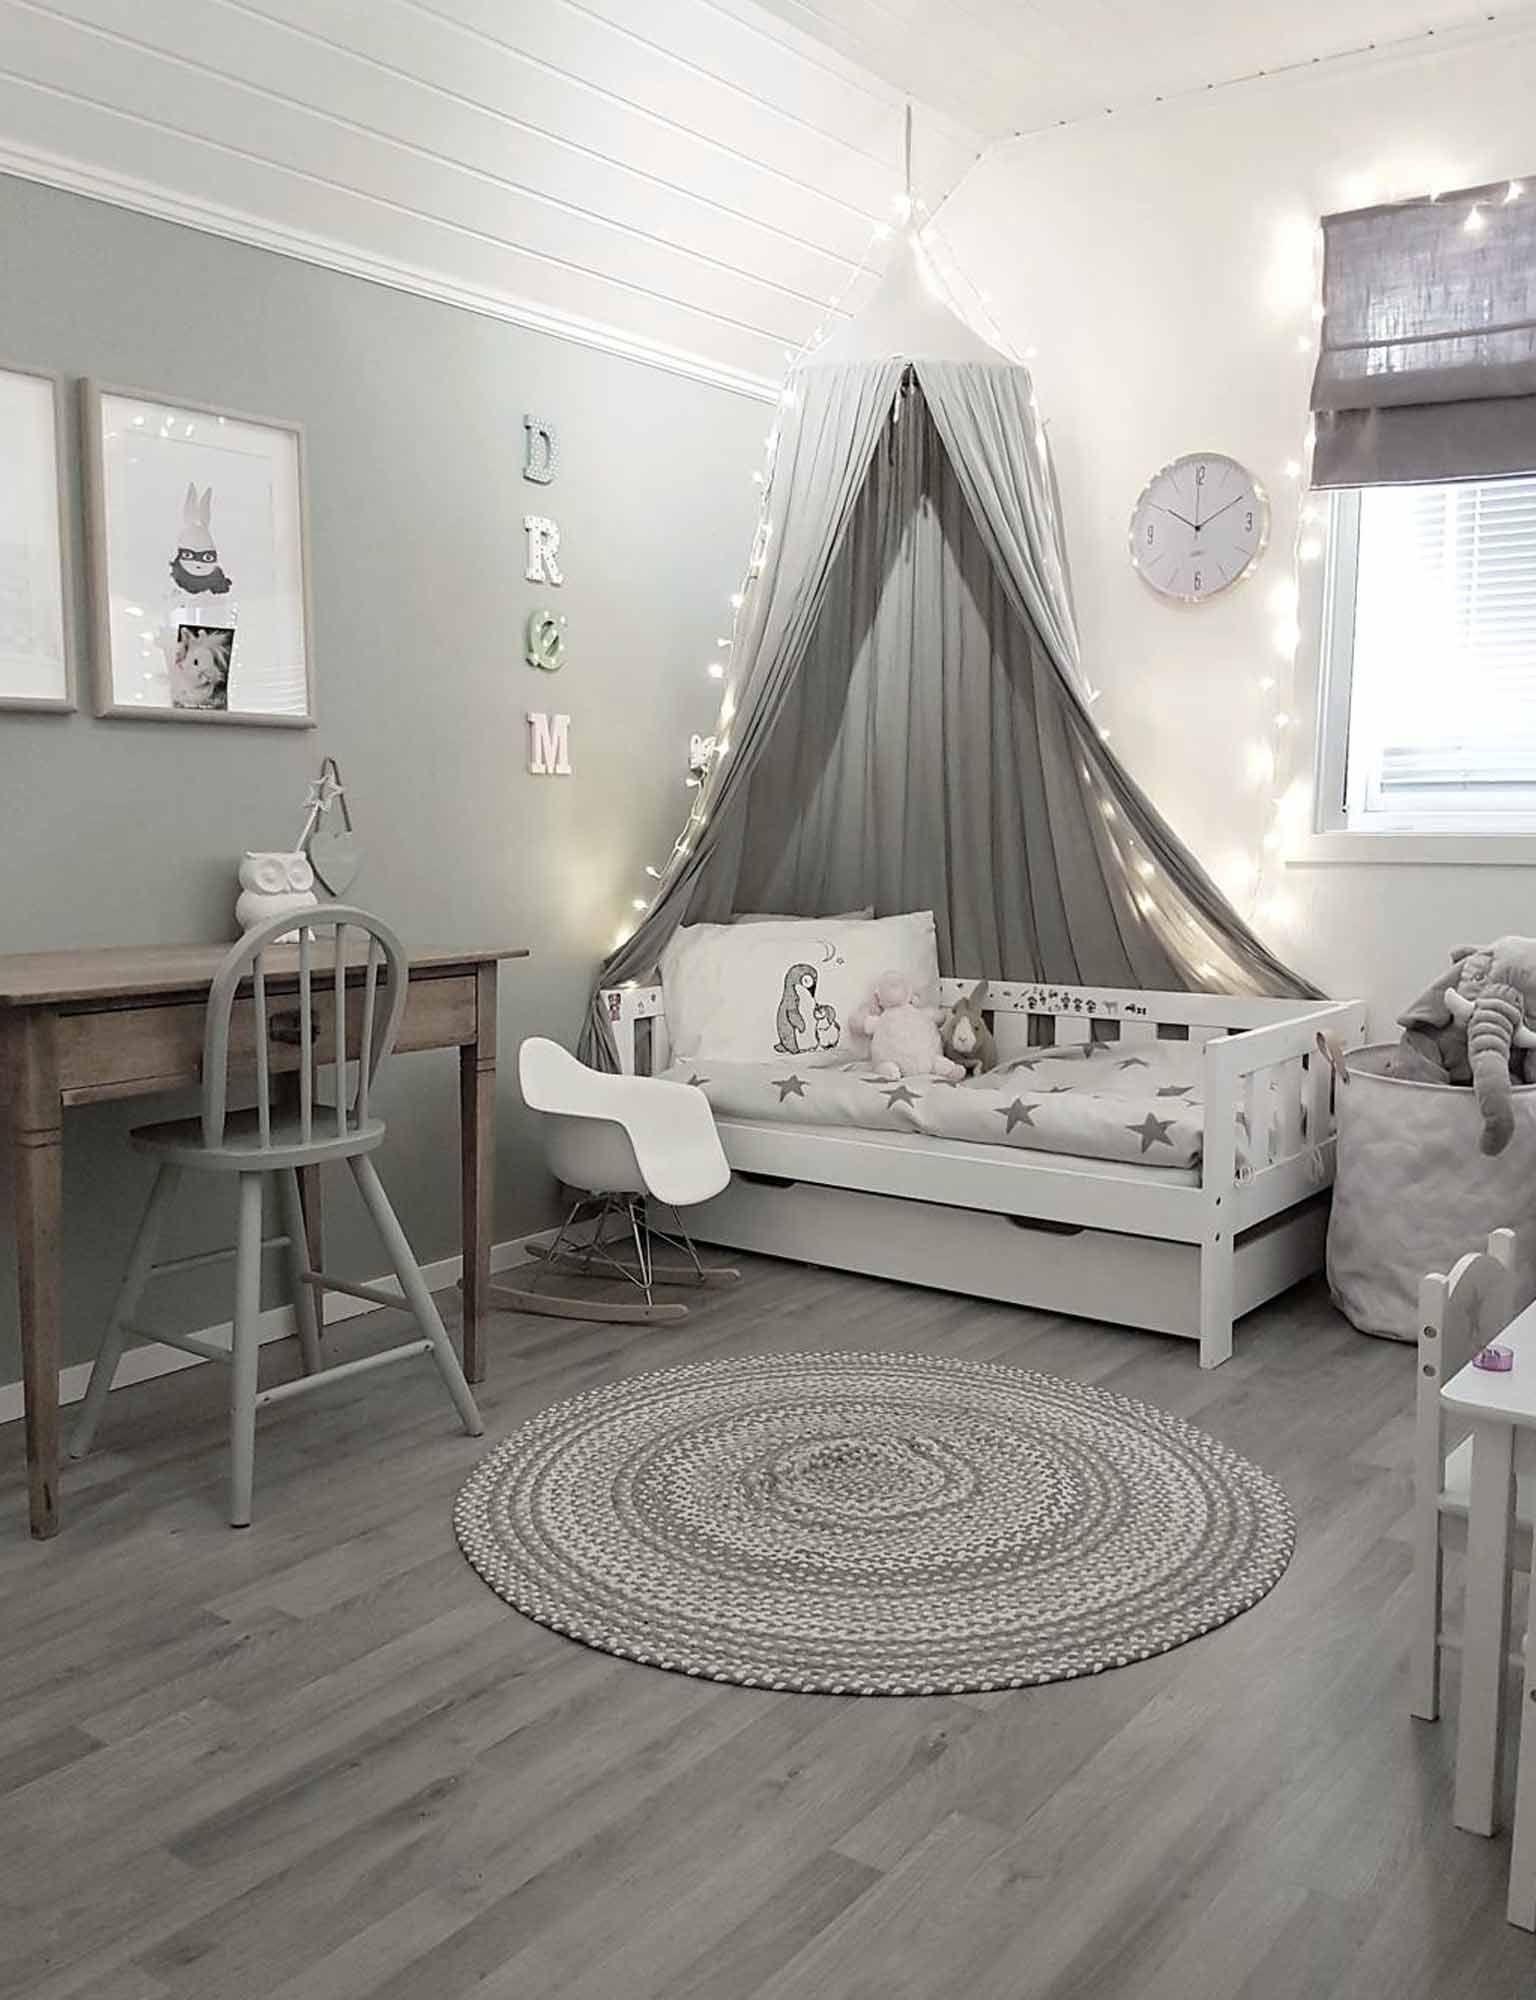 Bedroom Fairy Light Ideas Bedroom Fairy Lights Bedrooms And Lights - Fairy lights bedroom ideas